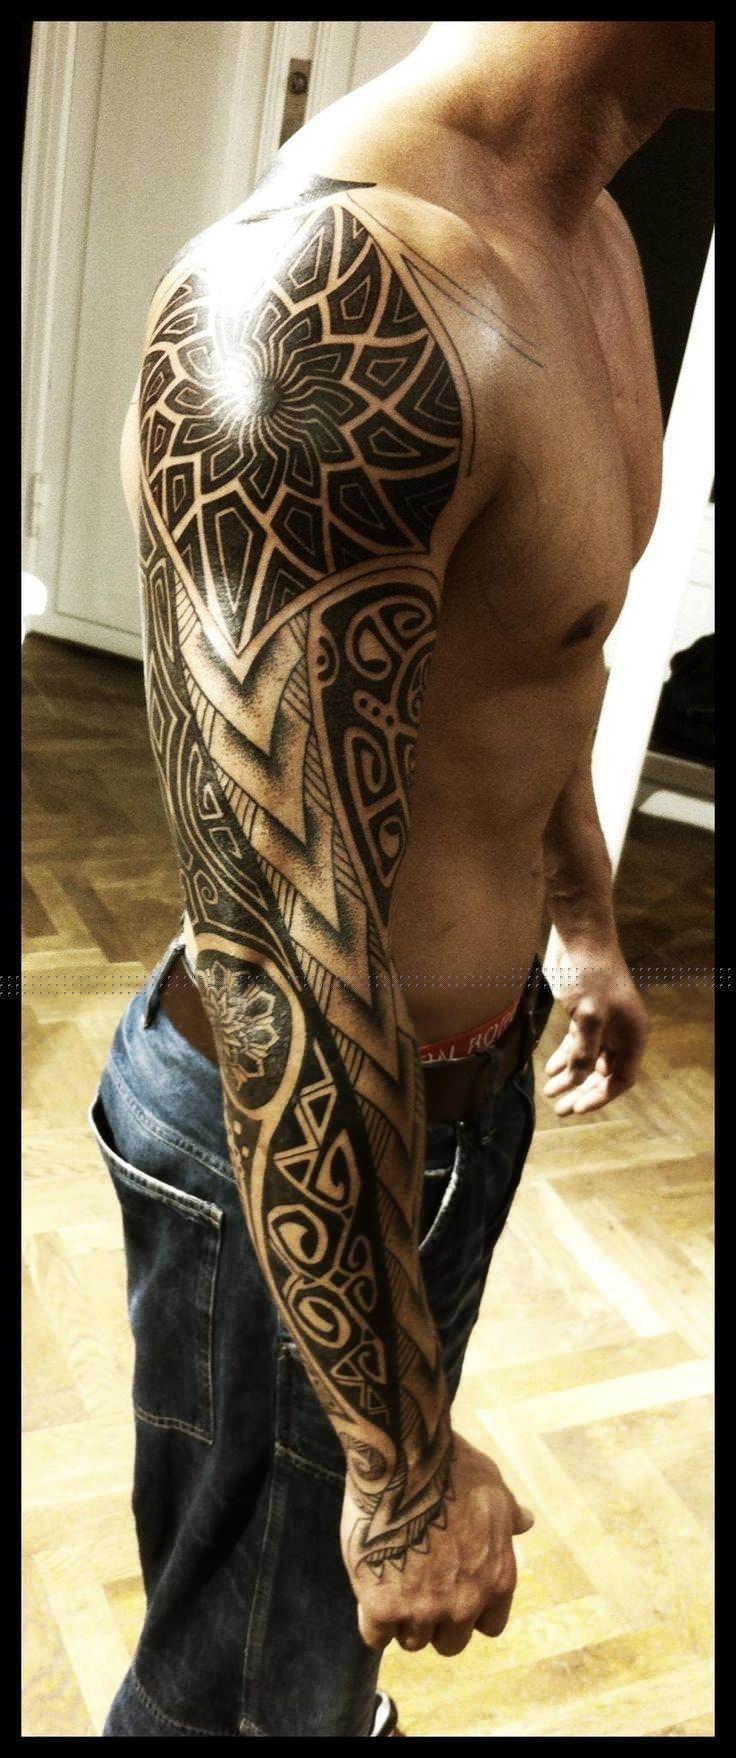 Tribal Skull Tattoo Sleeve: Armor Tattoos - Google Search